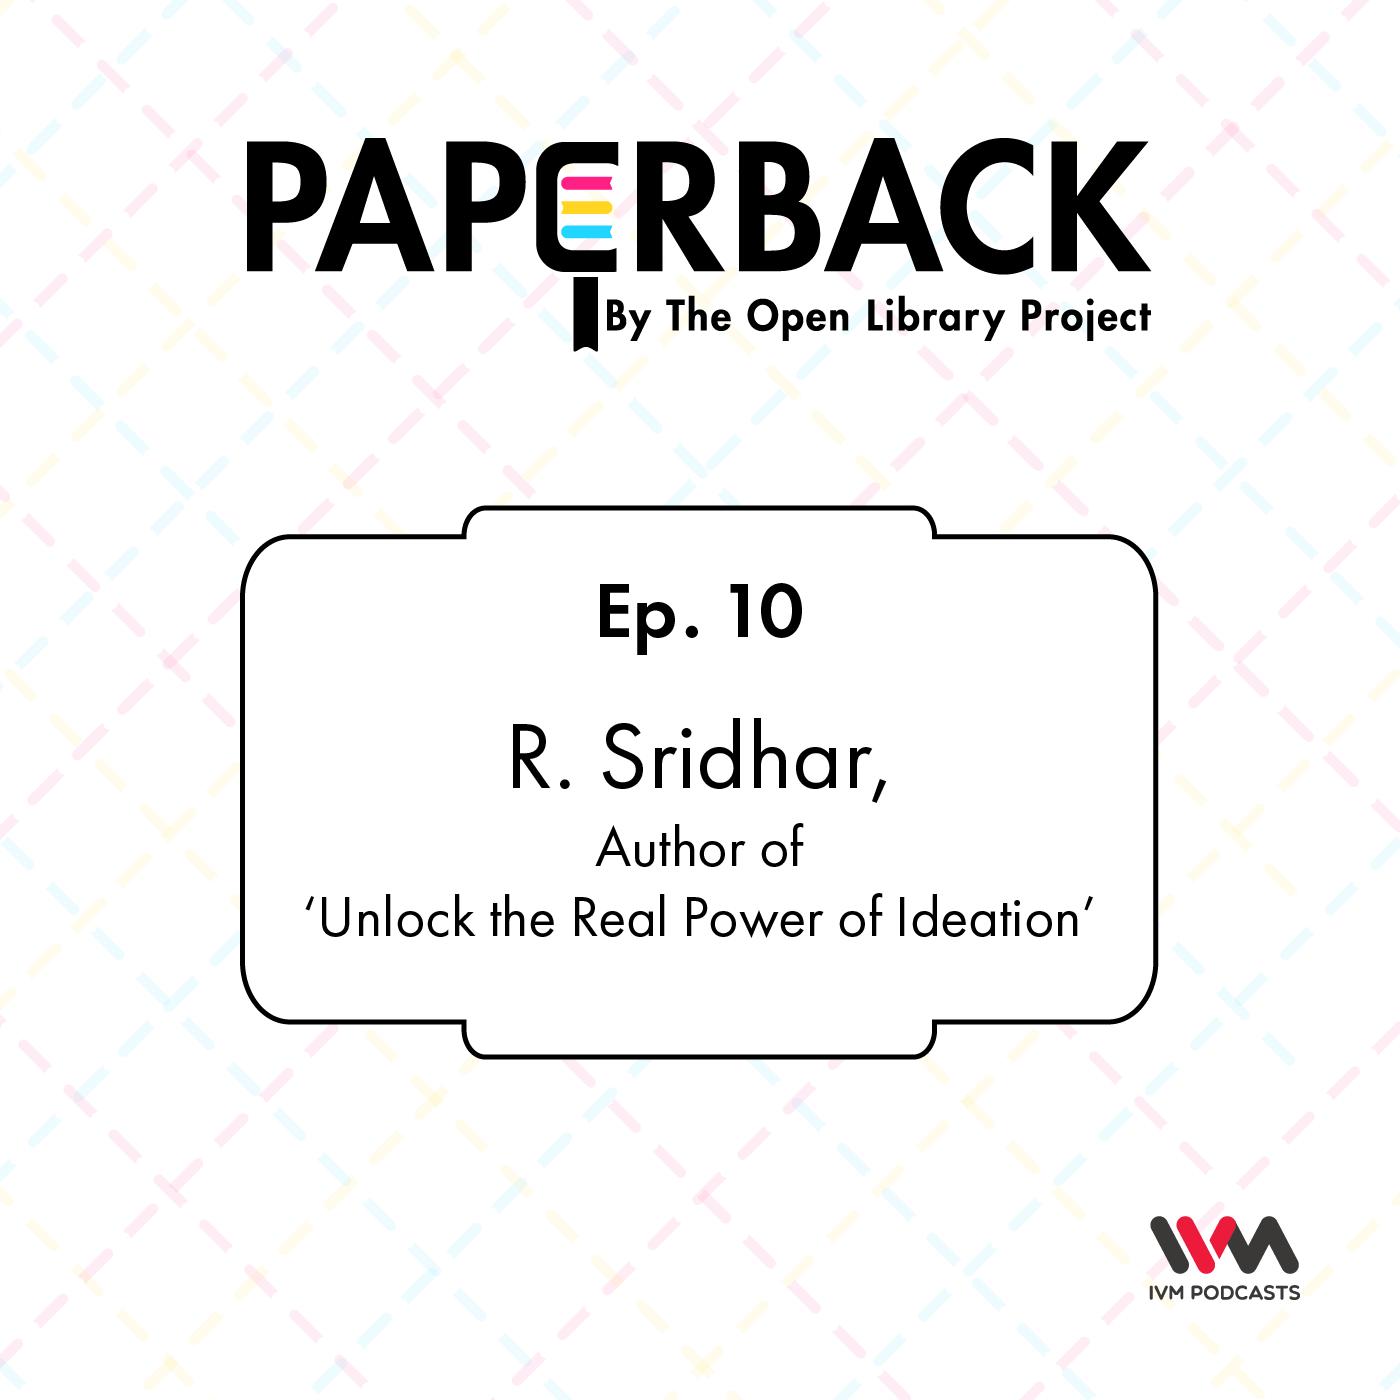 Ep. 10: R. Sridhar